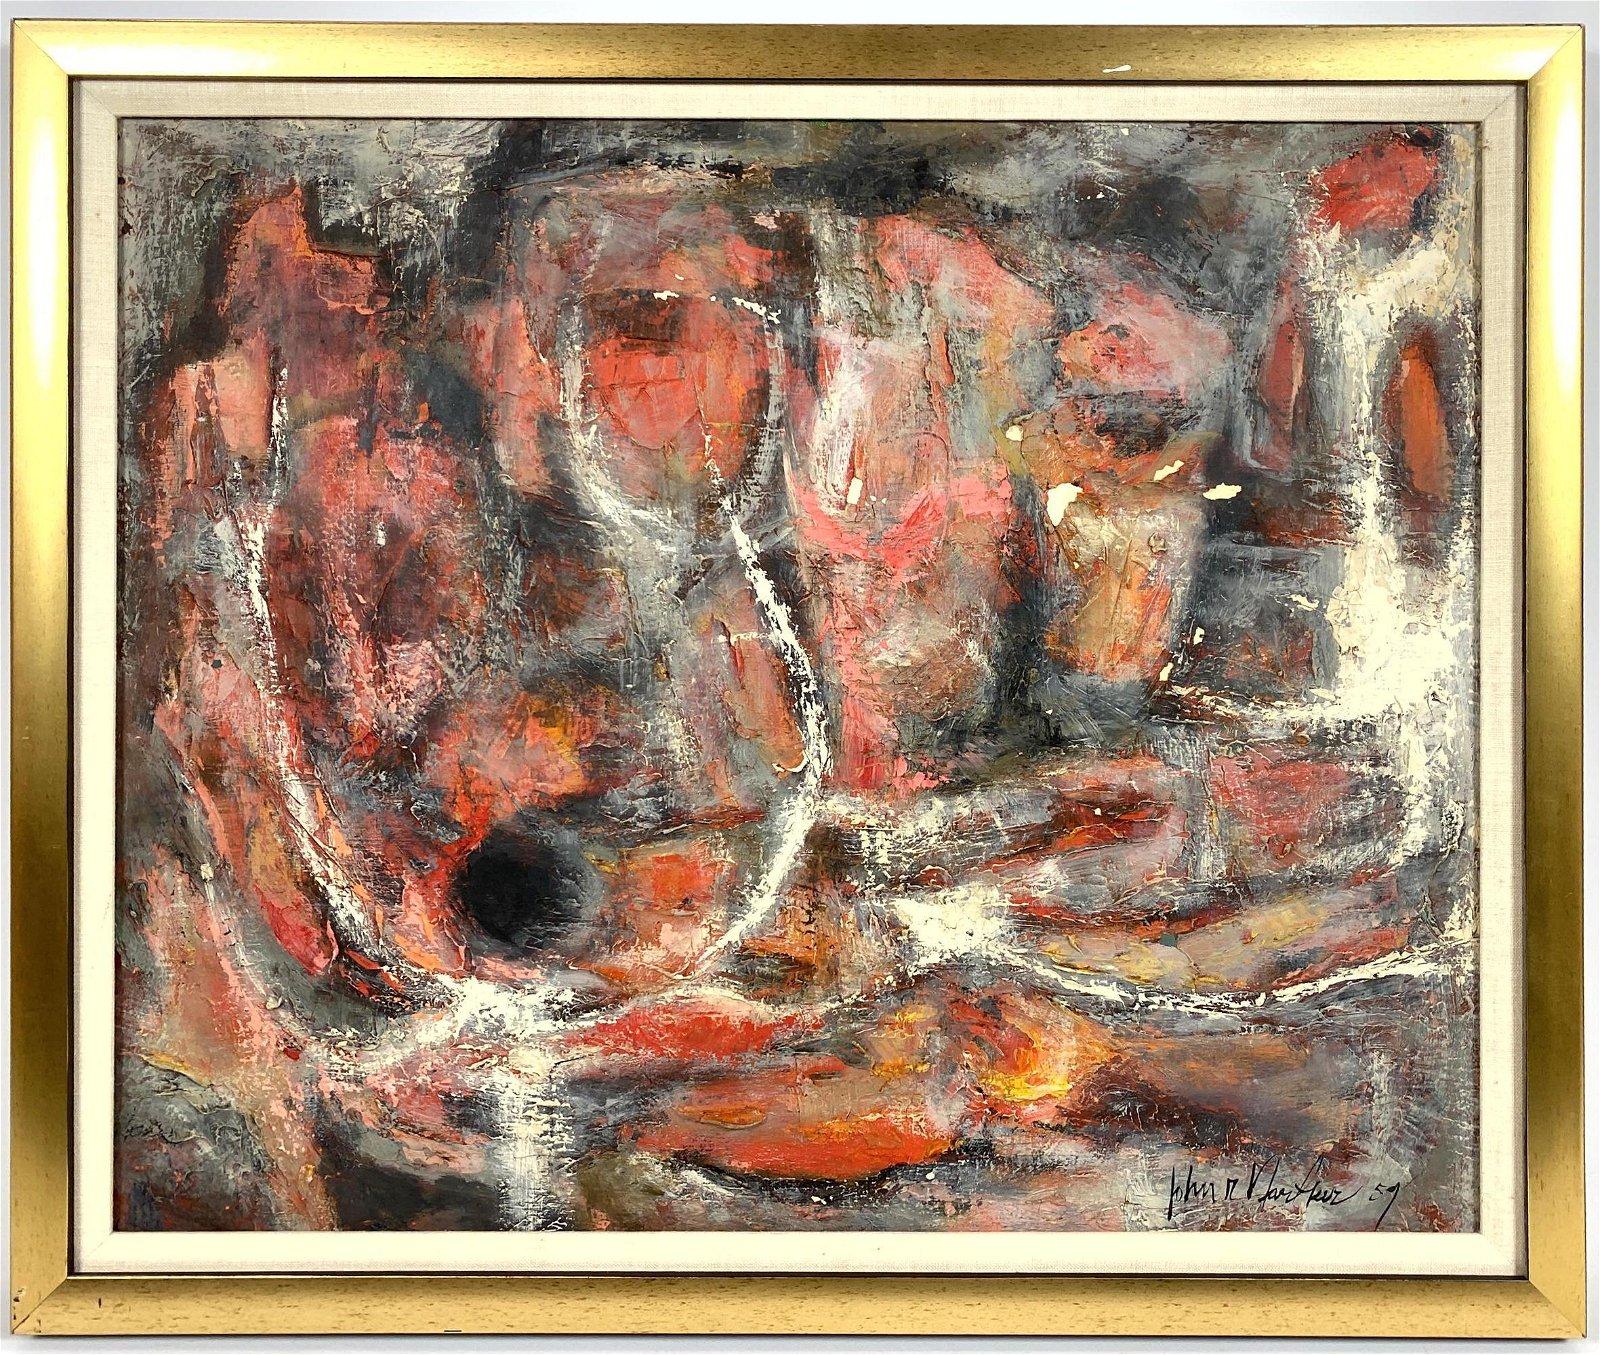 JOHN NARTKER 1959 Modernist Abstract Oil on Canvas. Cha